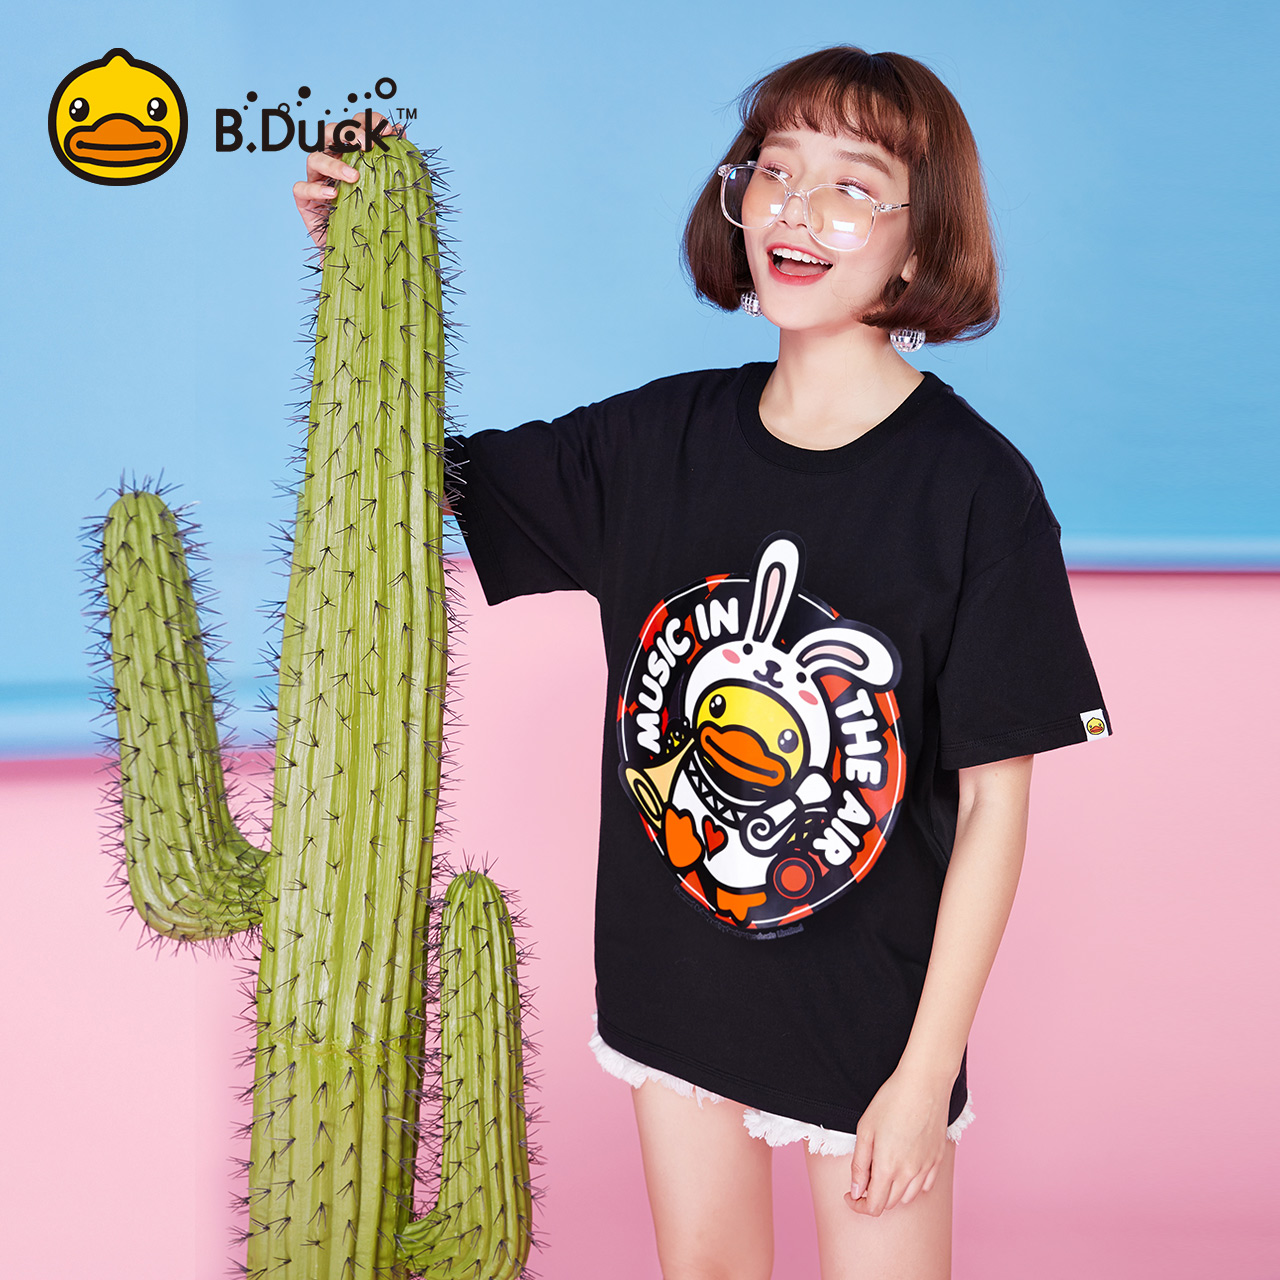 BDuck小黄鸭女装2018夏新款短袖时尚印花卡通T恤宽松上衣打底衫潮